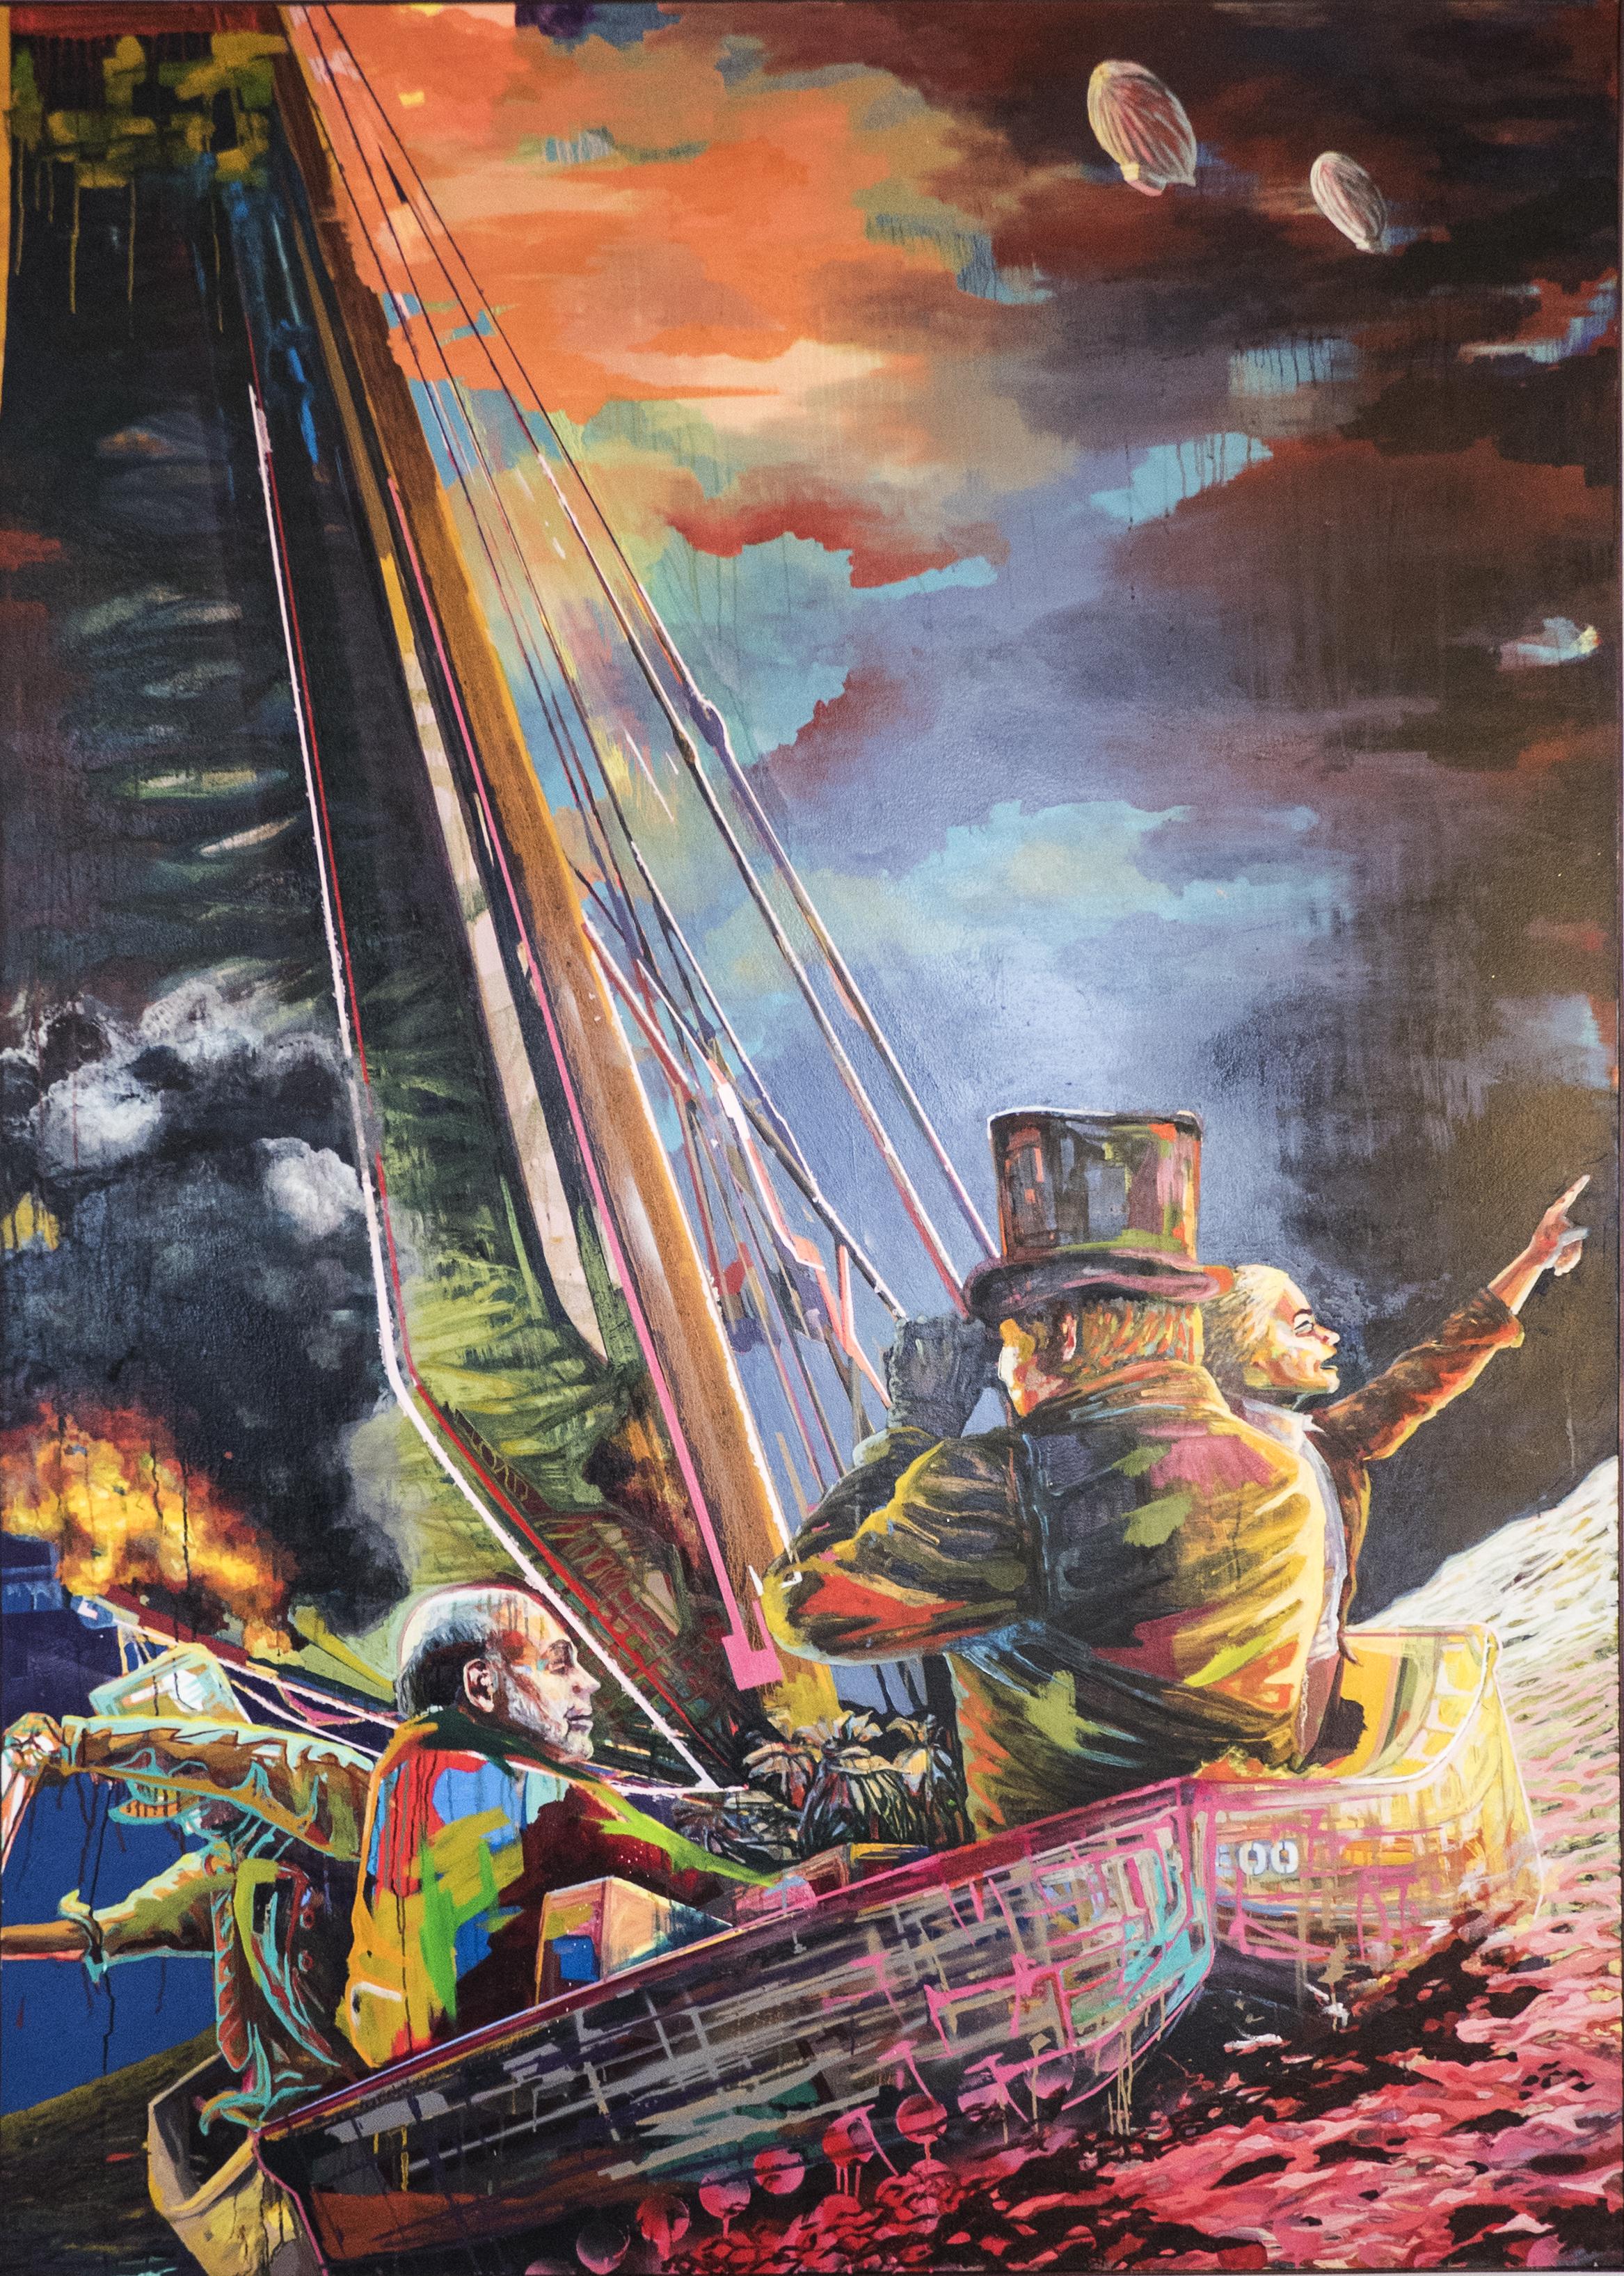 Morning Skies  | oil, aerosol on canvas | 9' x 6' (SOLD)